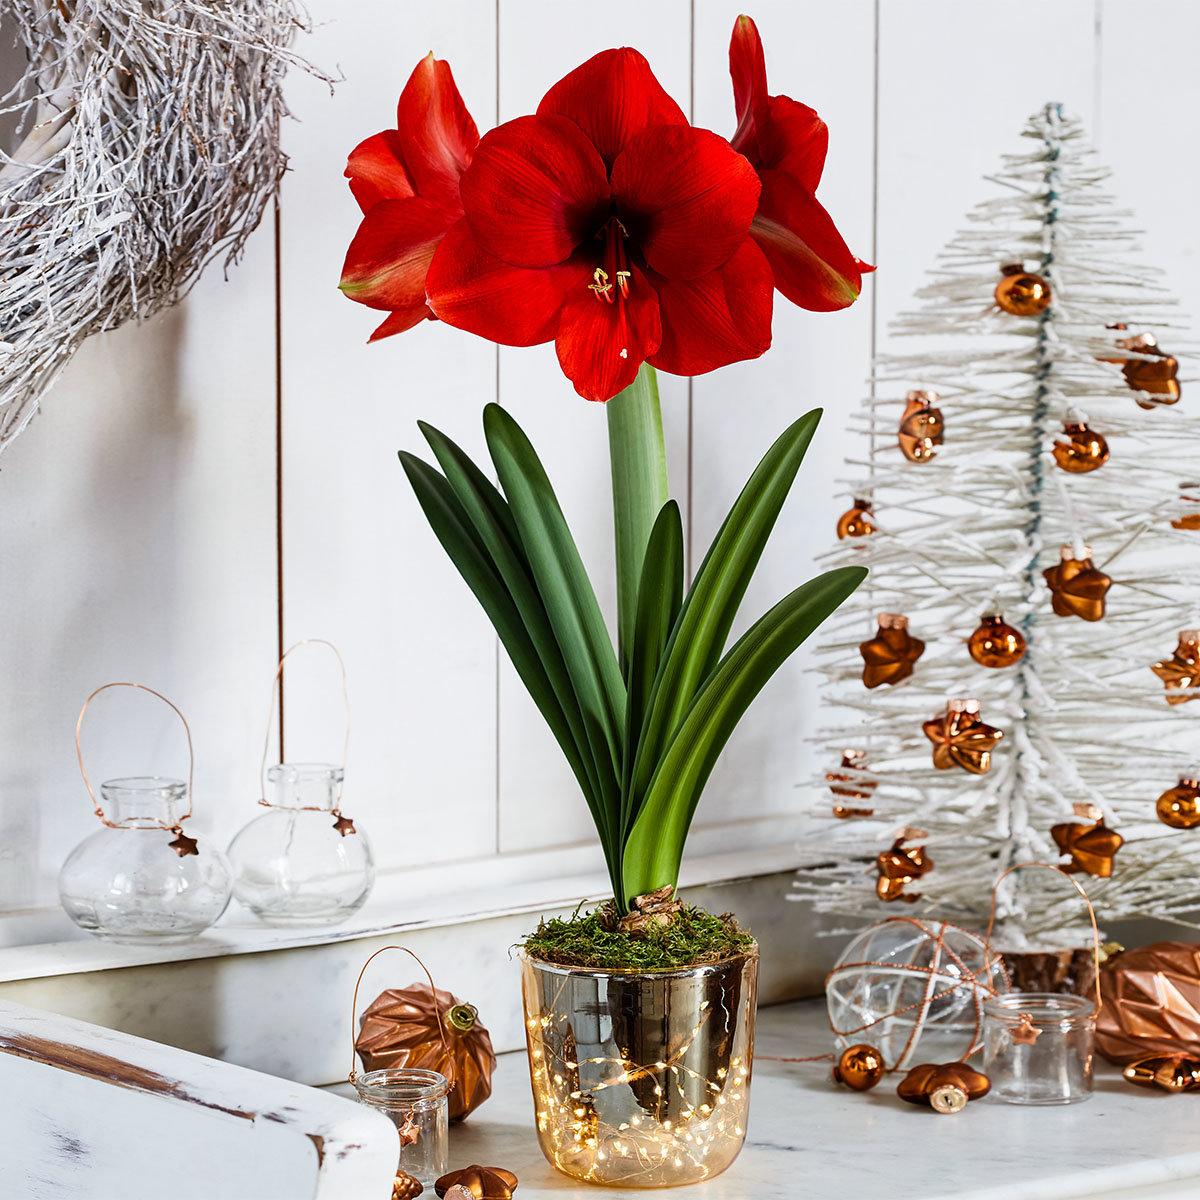 Amaryllis-Set: Amaryllis, Acrylglas-Vase, Moos, LED-Lichterkette, mit Batterien